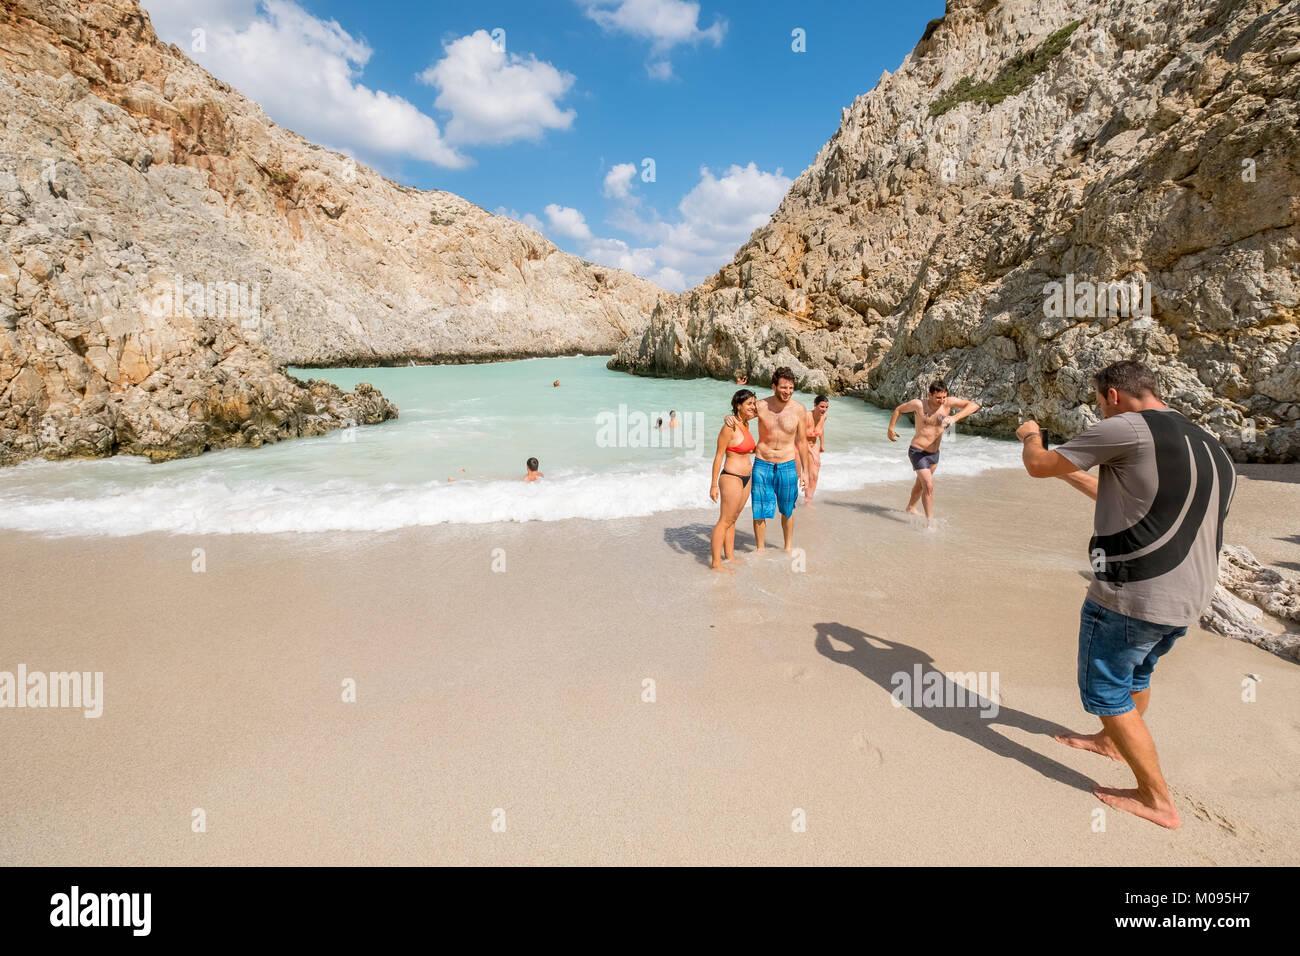 Seitan limania Strand, versteckte Badebucht, Traumstrand, Chania, Europa, Kreta, Griechenland, Chania, Europa, Kreta, Stockbild